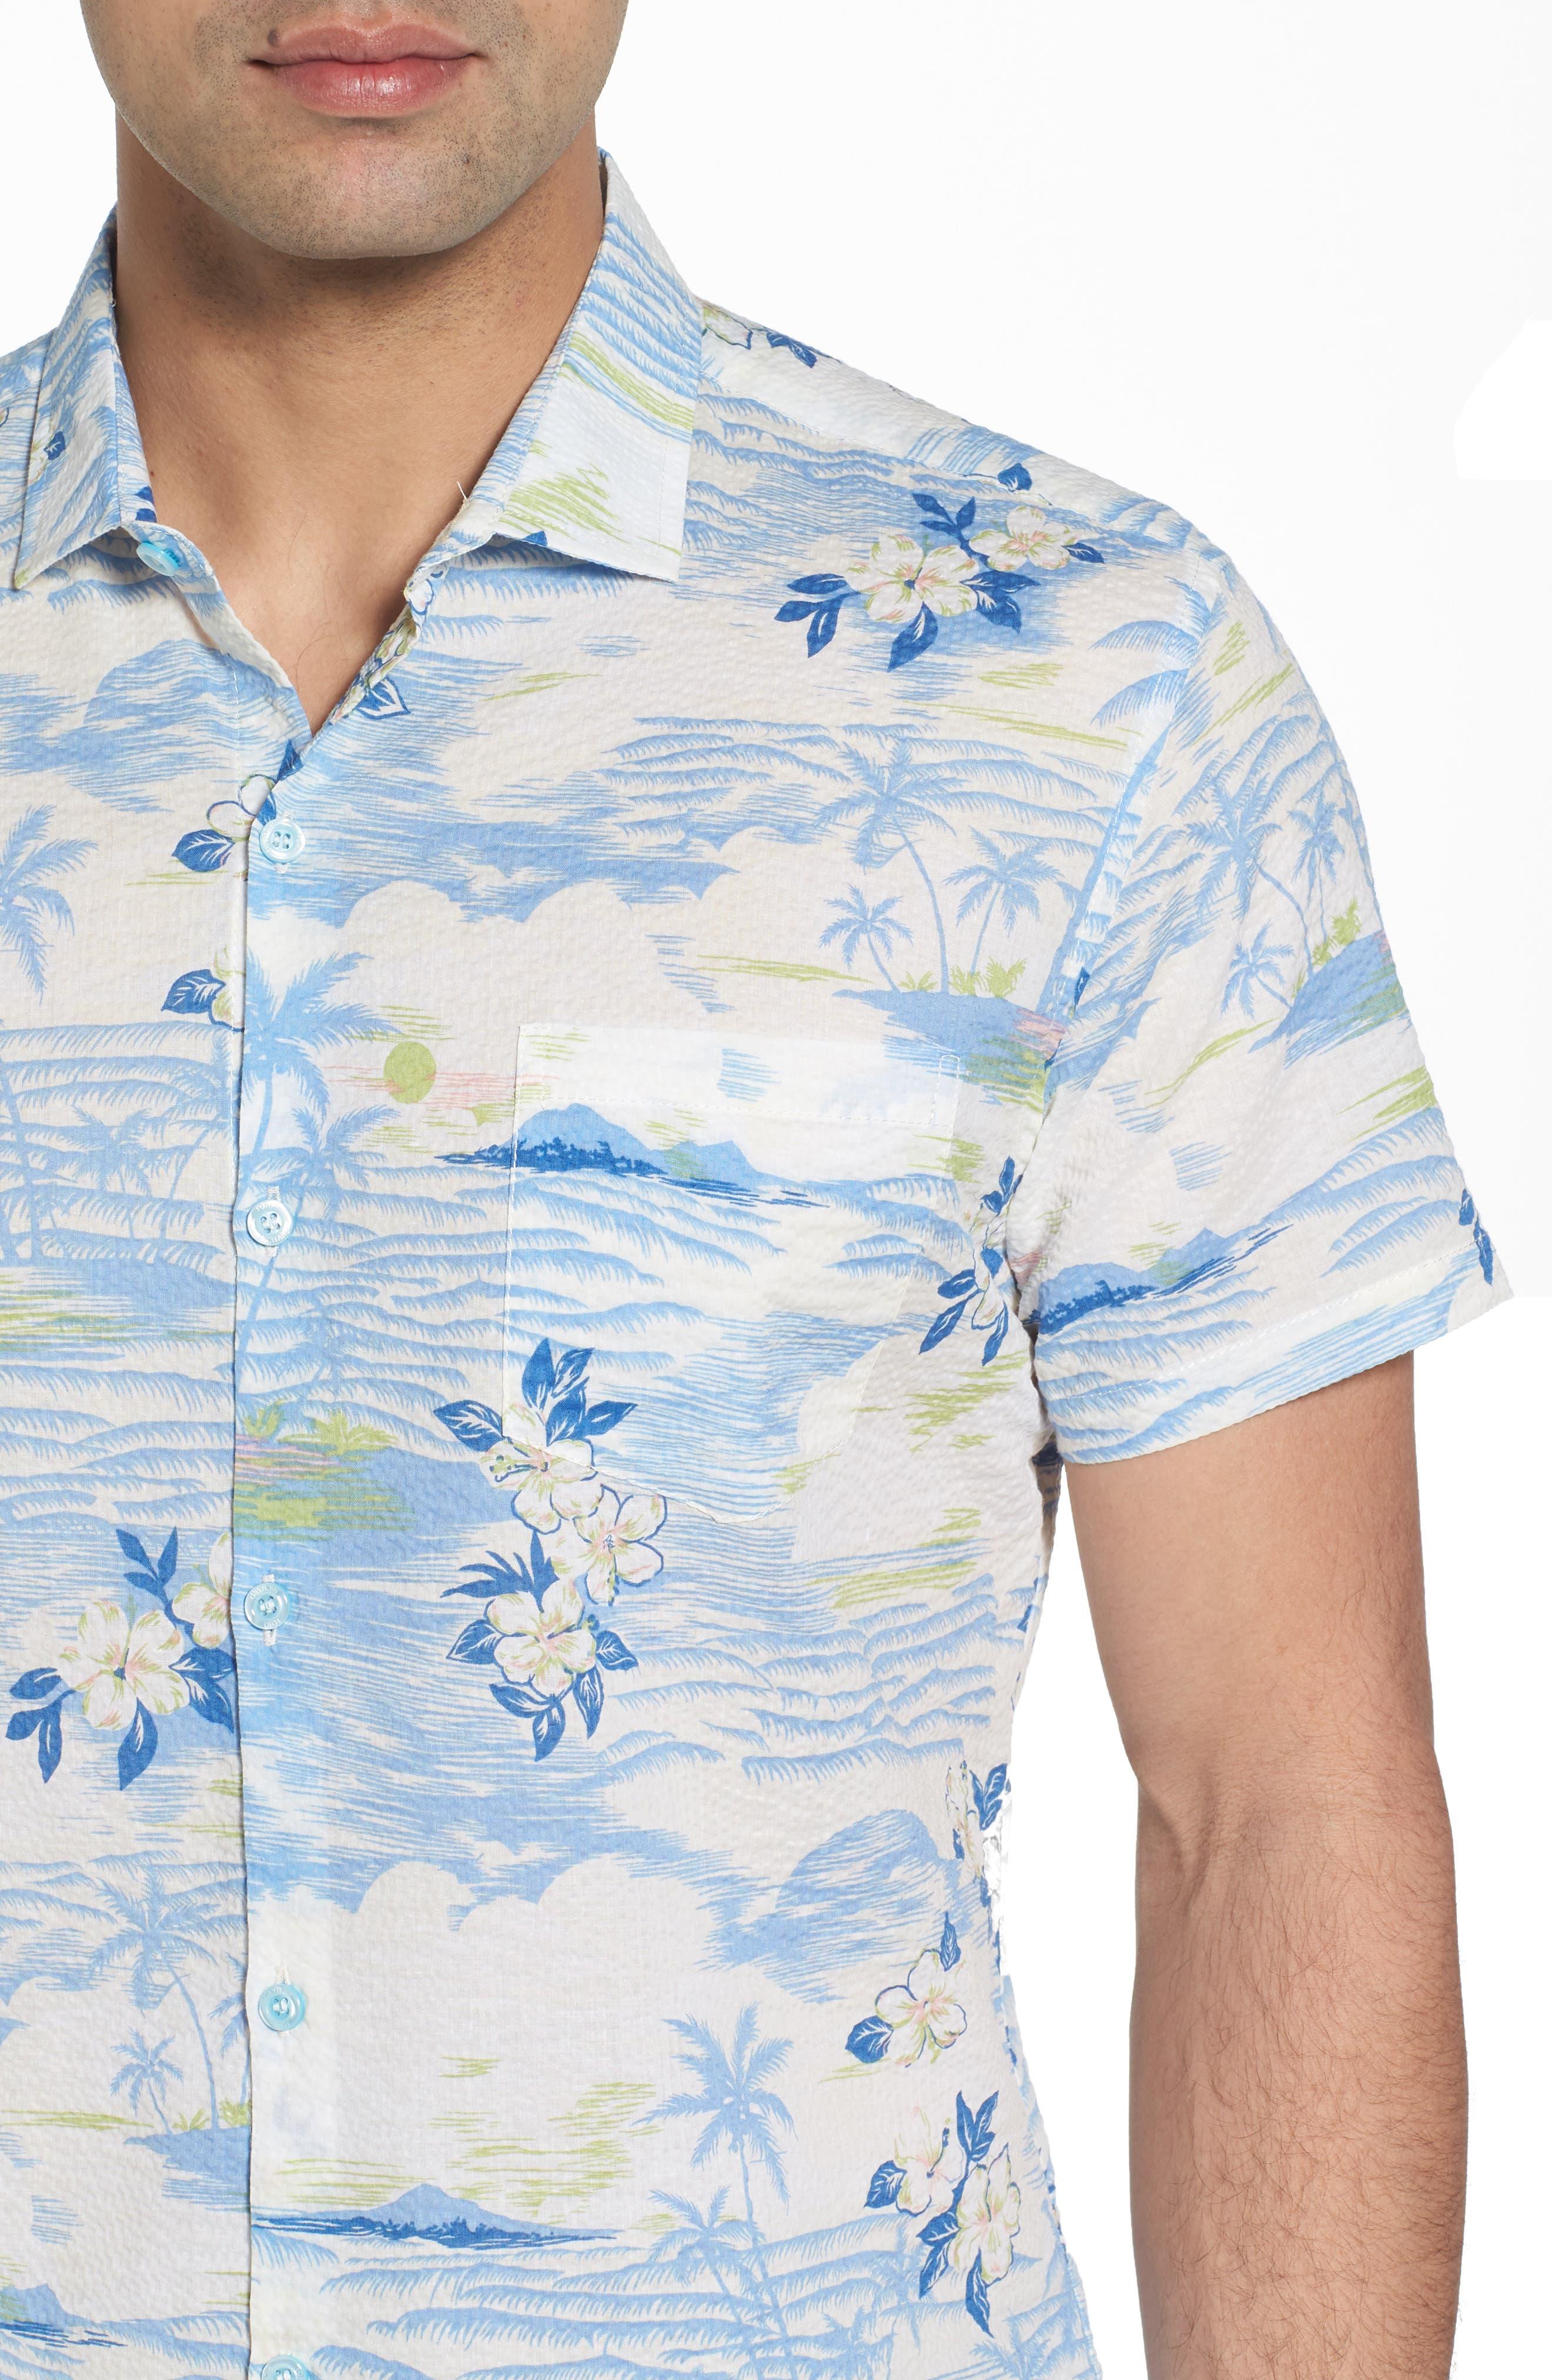 Tropic Dream Lawn Sport Shirt,                             Alternate thumbnail 4, color,                             409